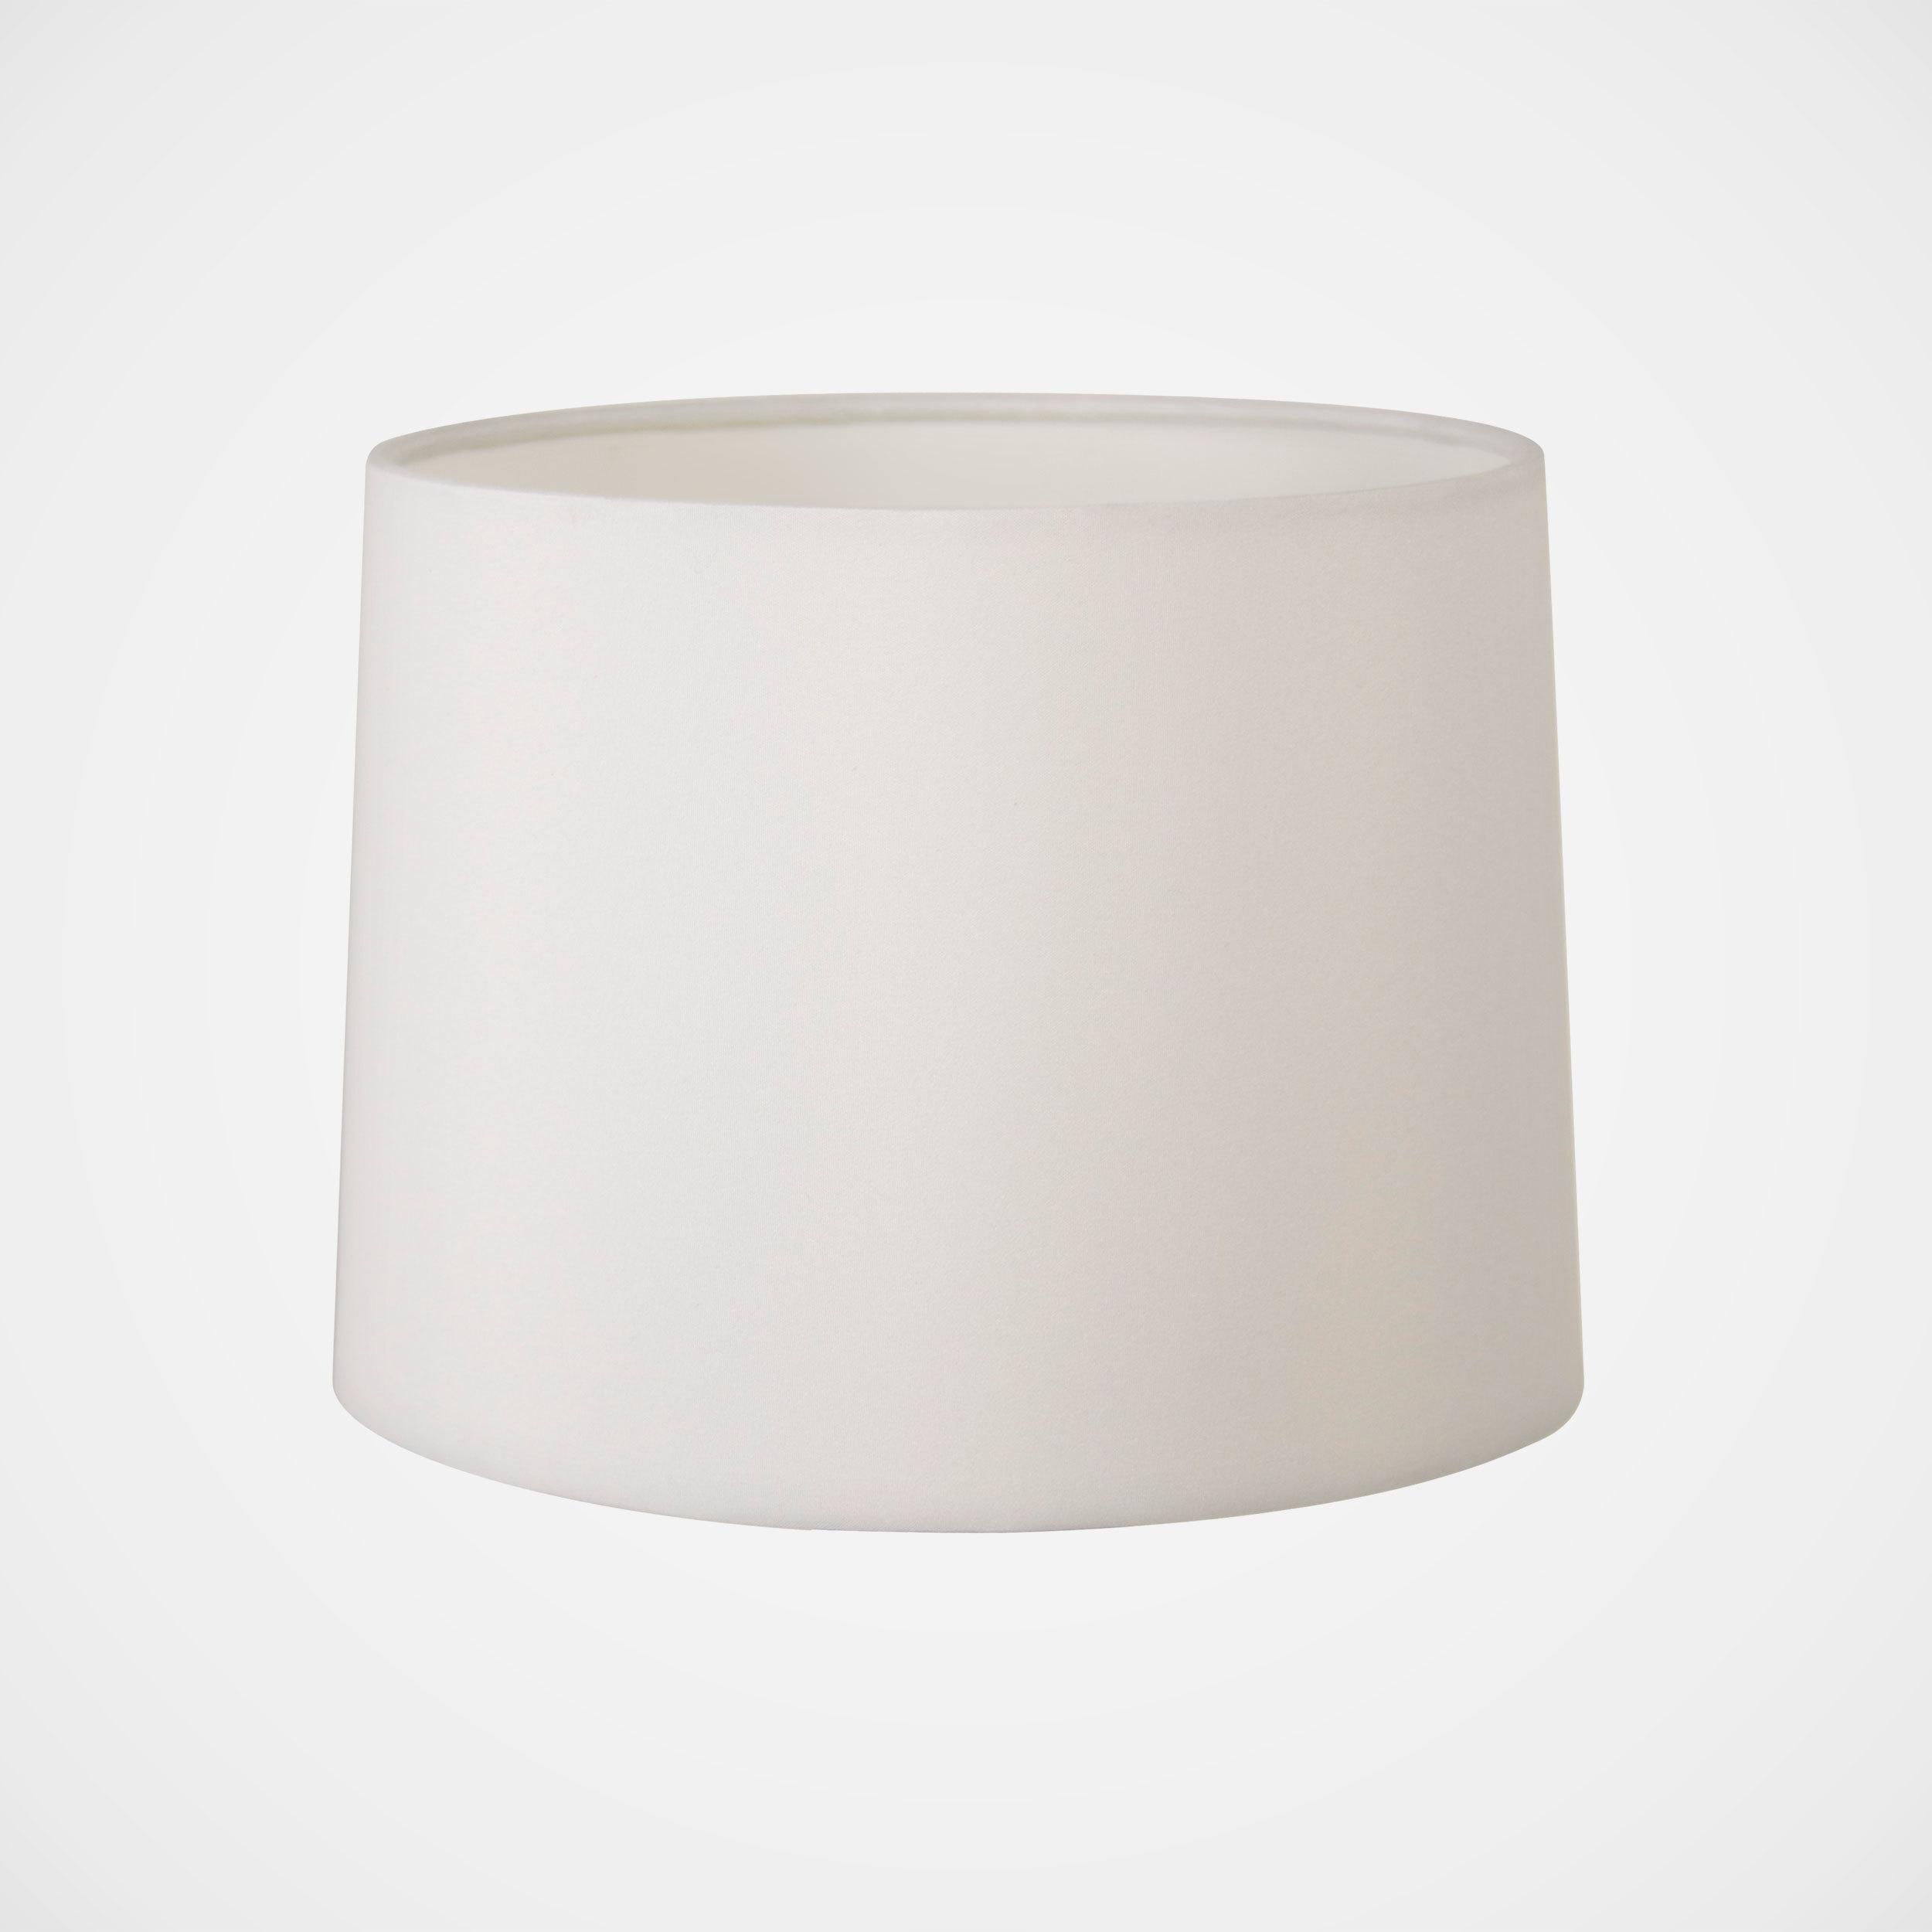 Абажур Astro Tapered Drum 5013001 (4049), белый, текстиль - фото 1